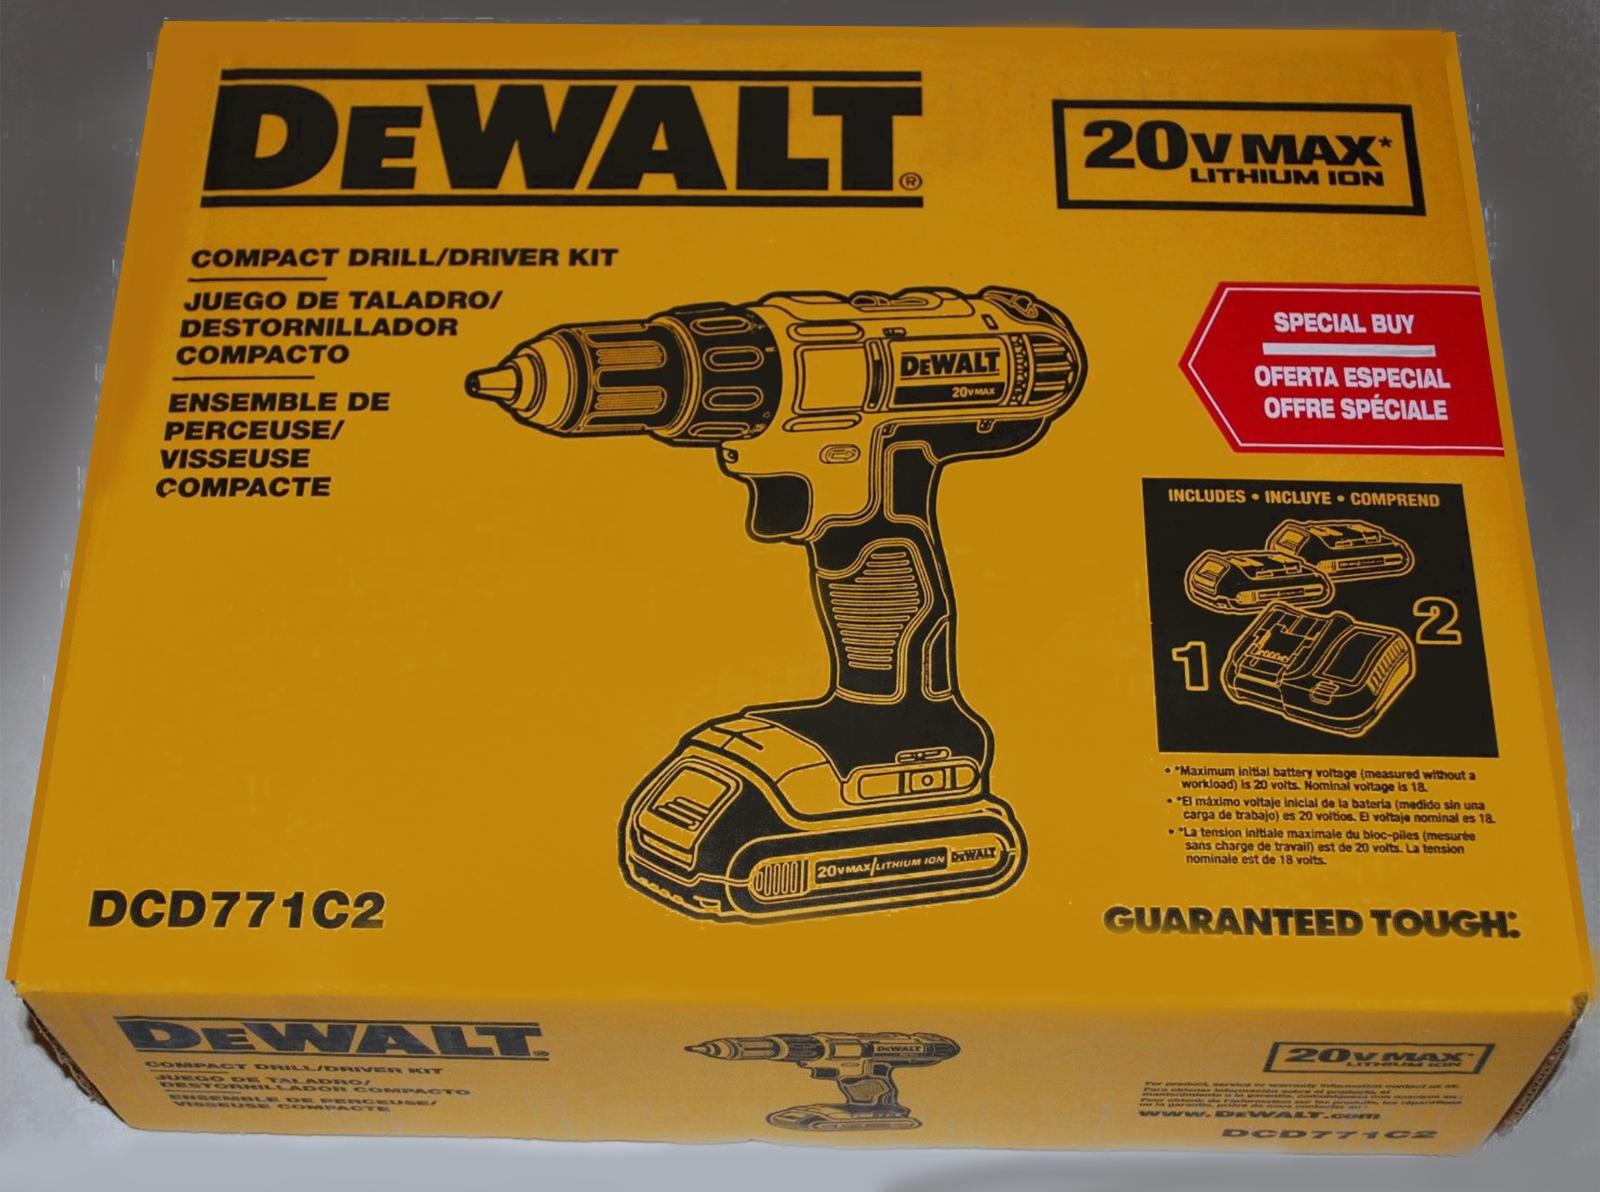 DEWALT 20-Volt Max Lithium-Ion 1/2 in. Cordless Drill/Driver